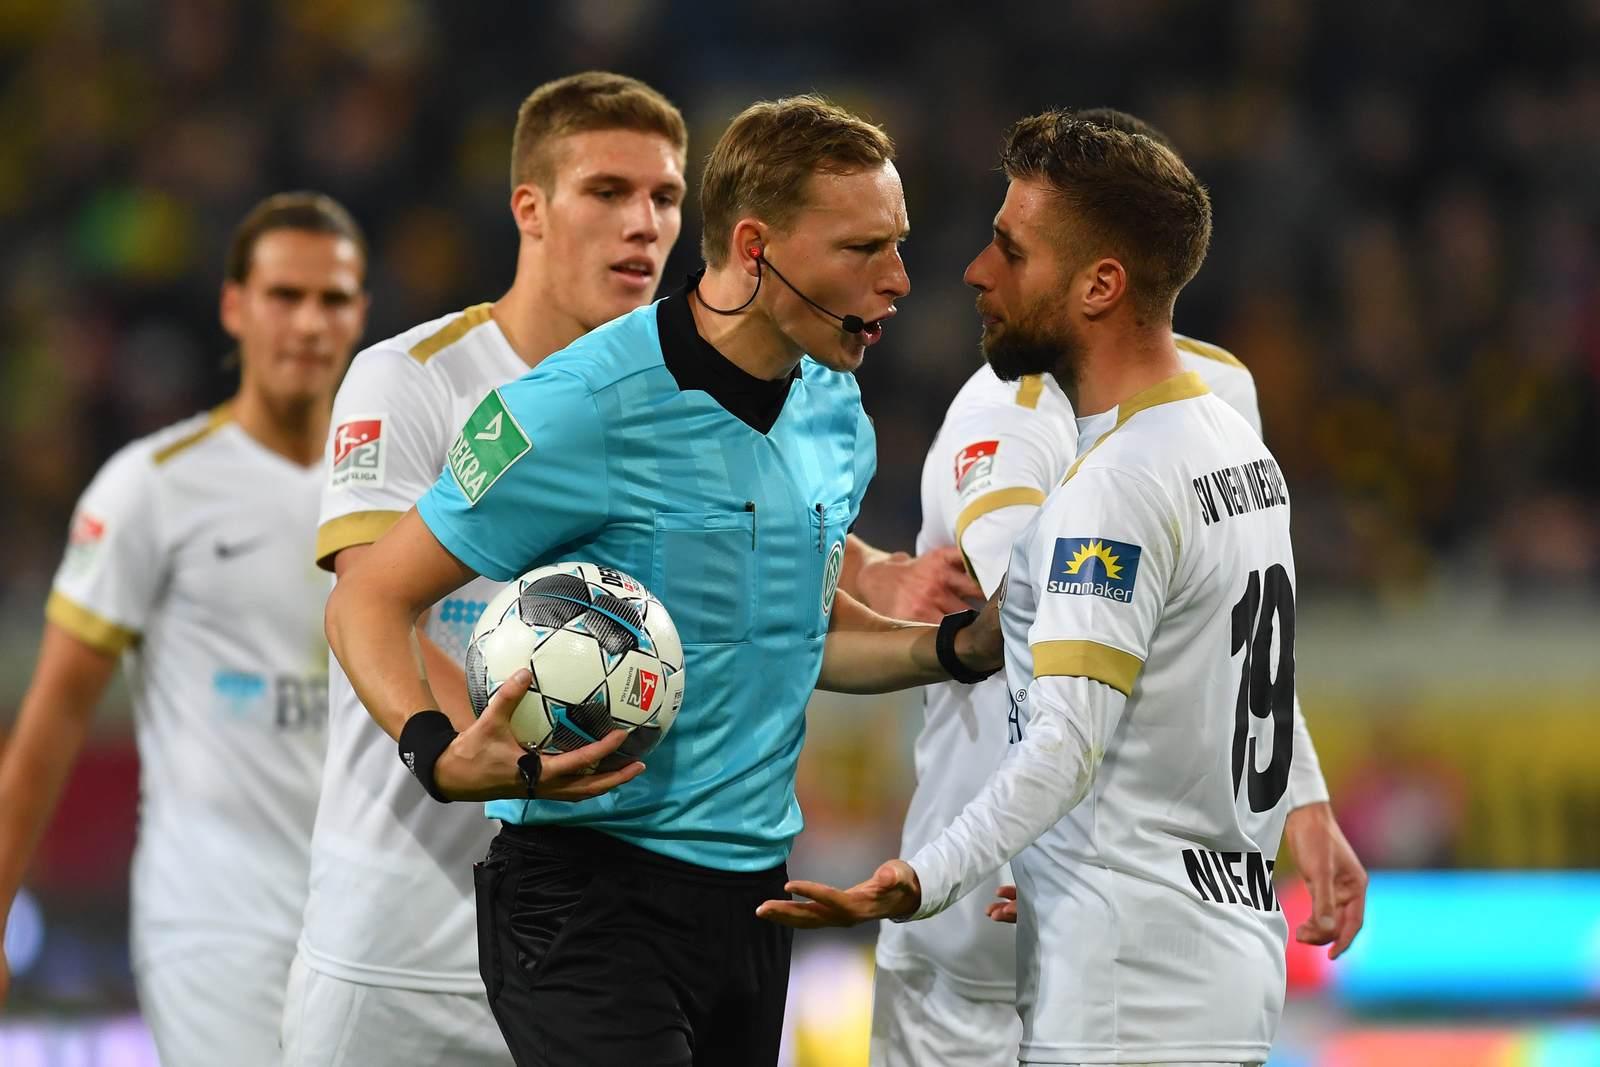 Martin Petersen im Spiel Dynamo Dresden gegen Wehen Wiesbaden